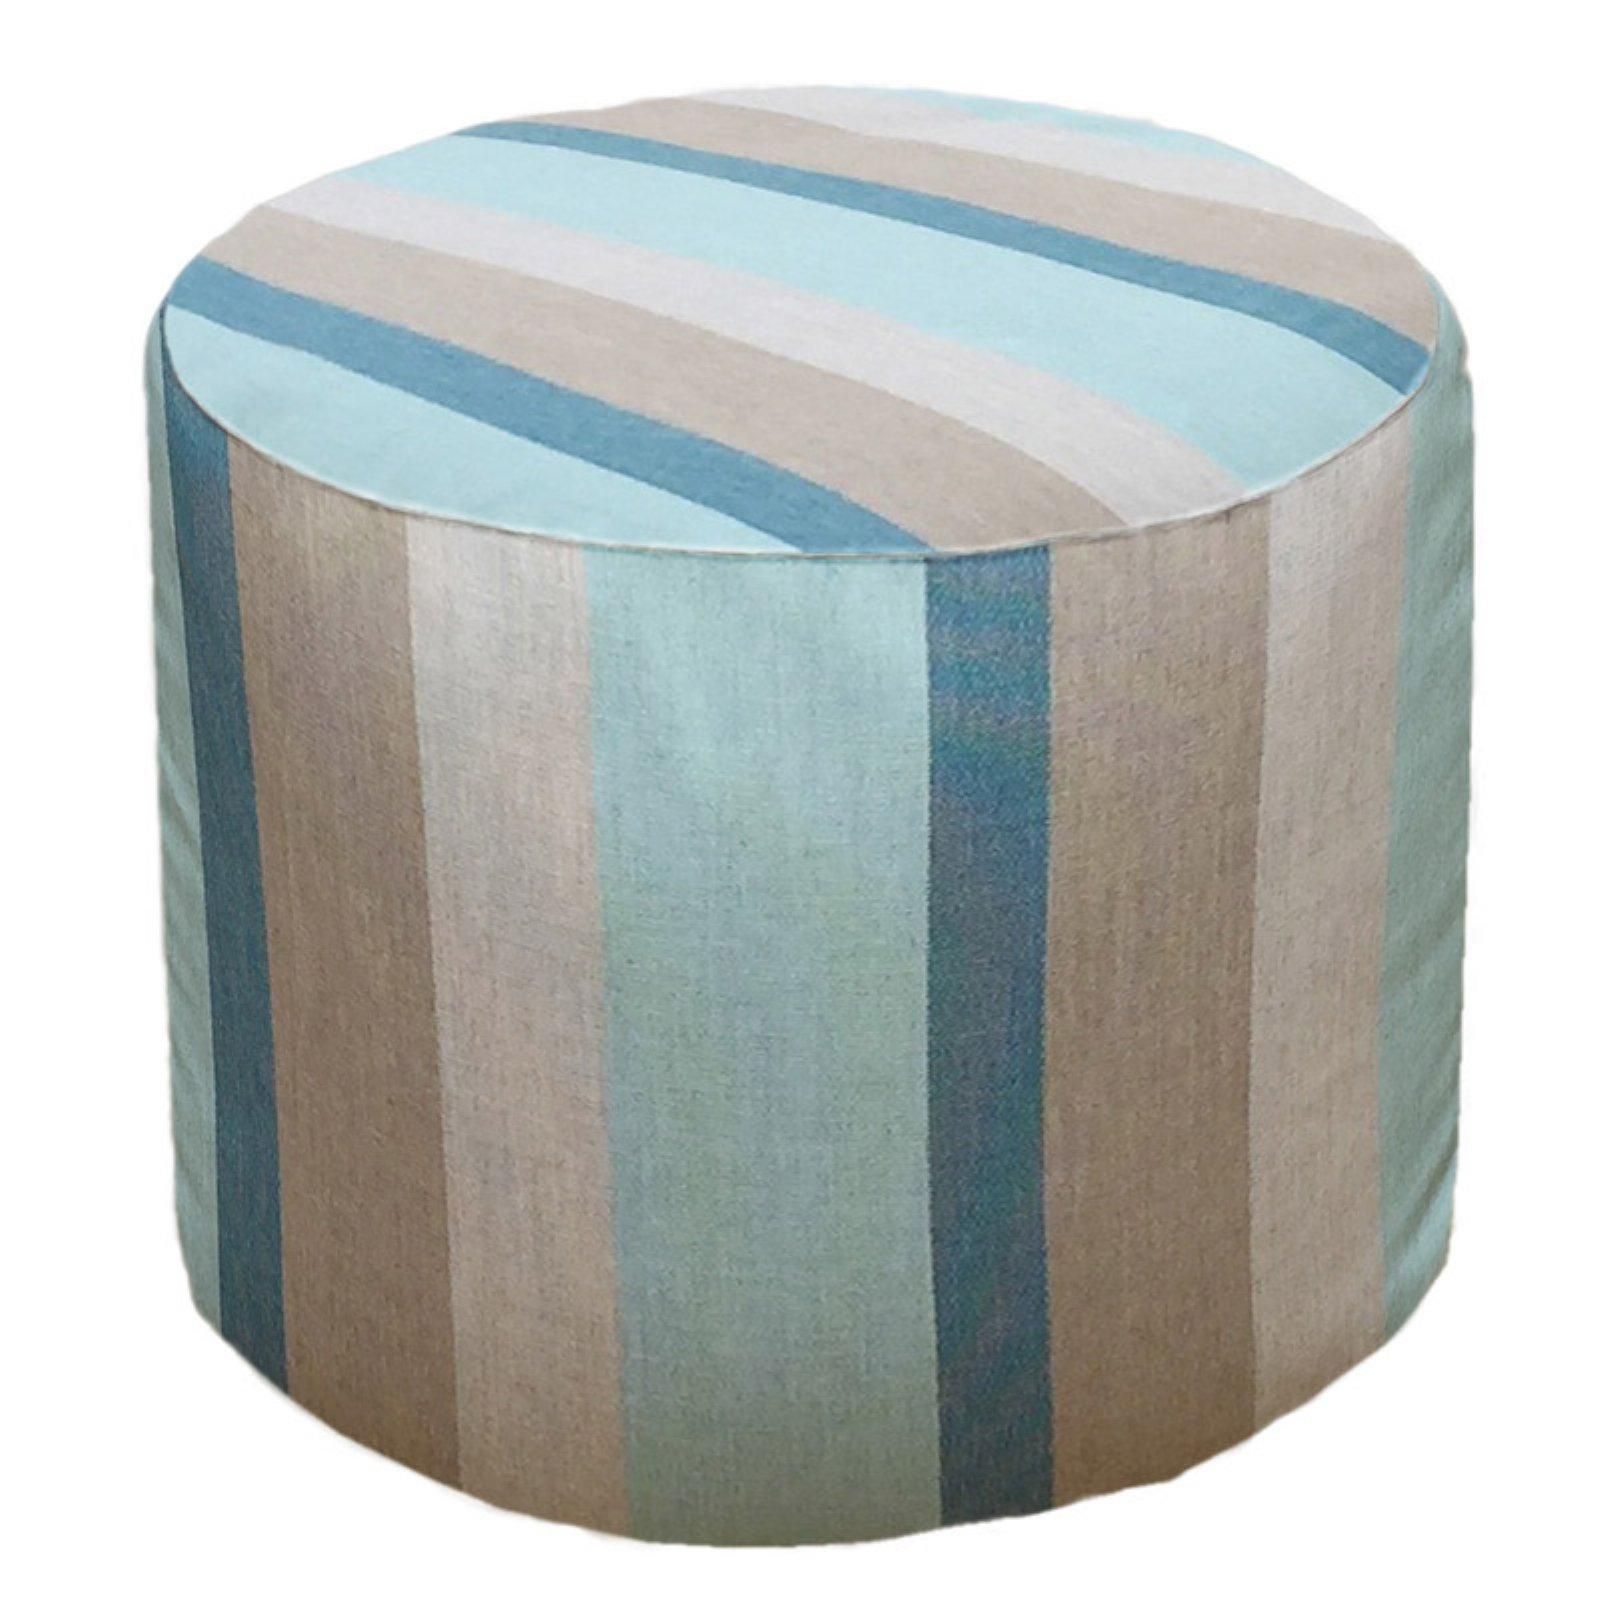 Magnificent Core Covers Outdoor Indoor 22 In Round Sunbrella Pouf Machost Co Dining Chair Design Ideas Machostcouk